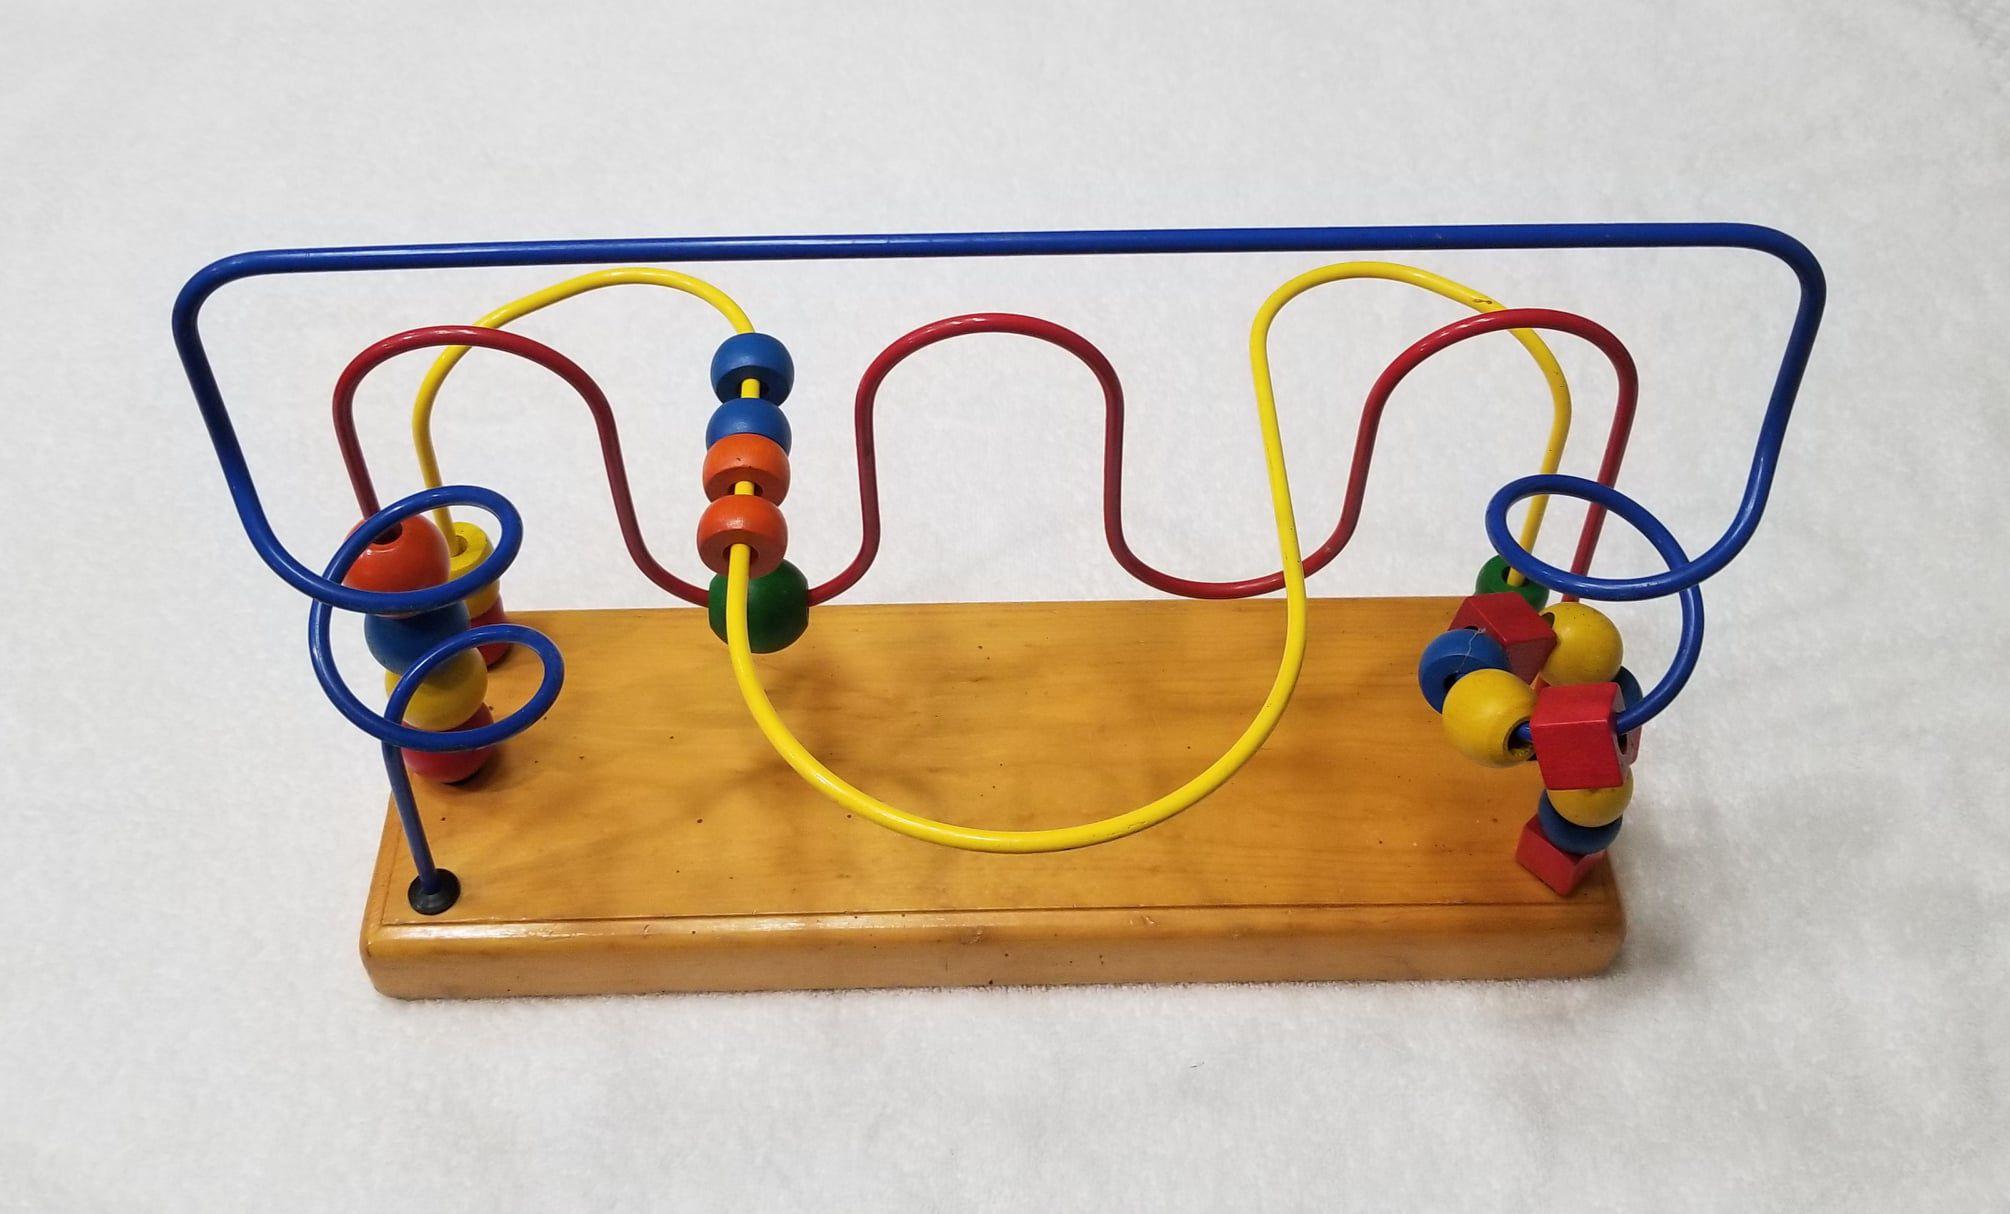 Bead toys are $5 each